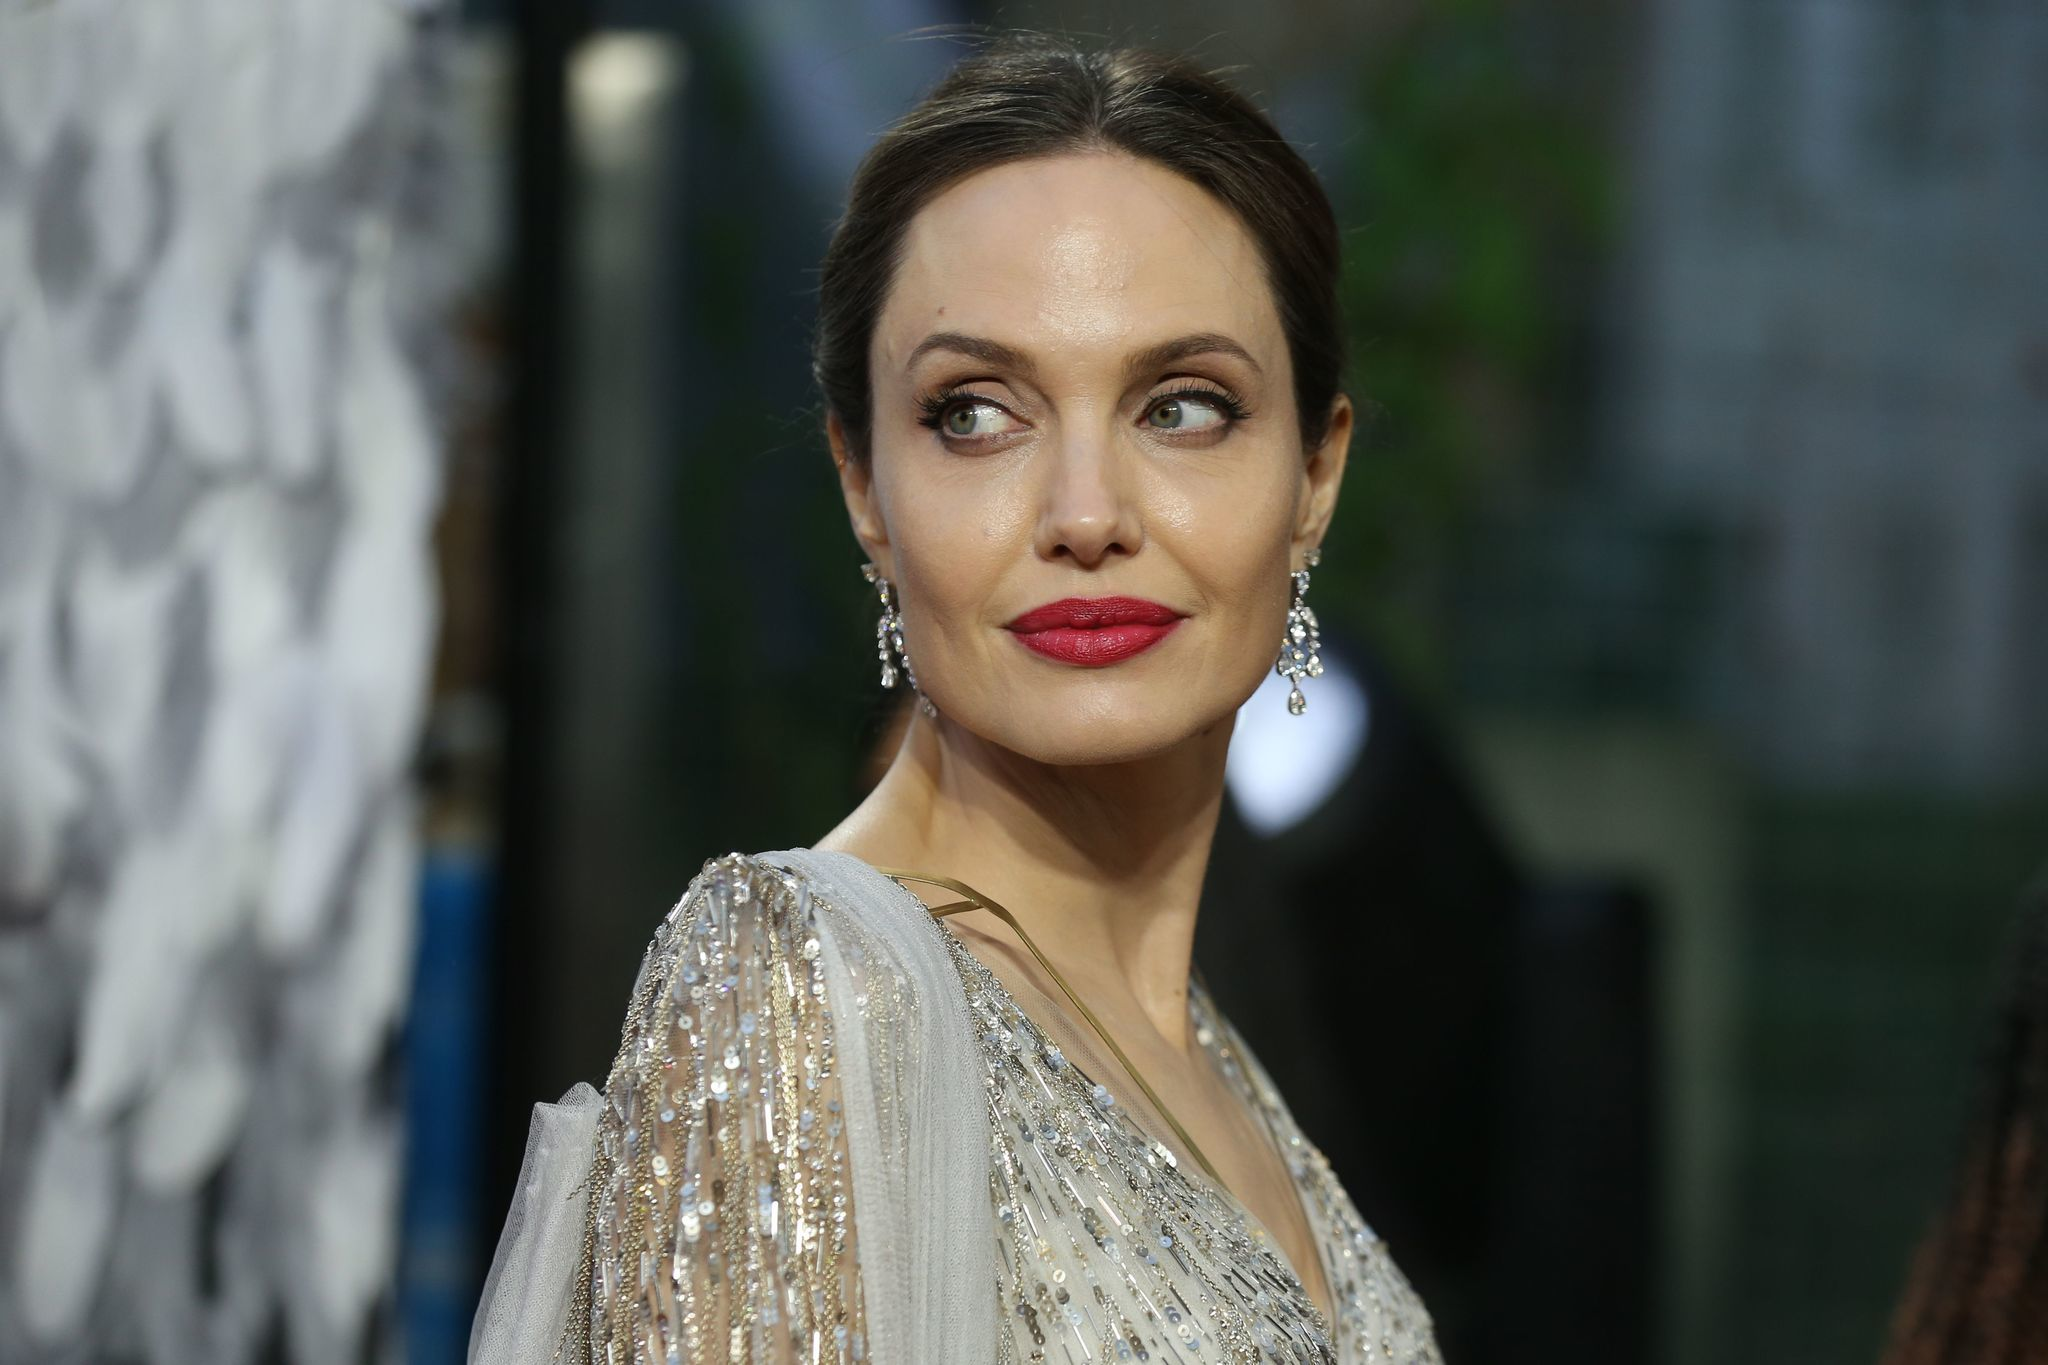 Angelina Jolie donates $1 million to No Kid Hungry campaign amid coronavirus crisis